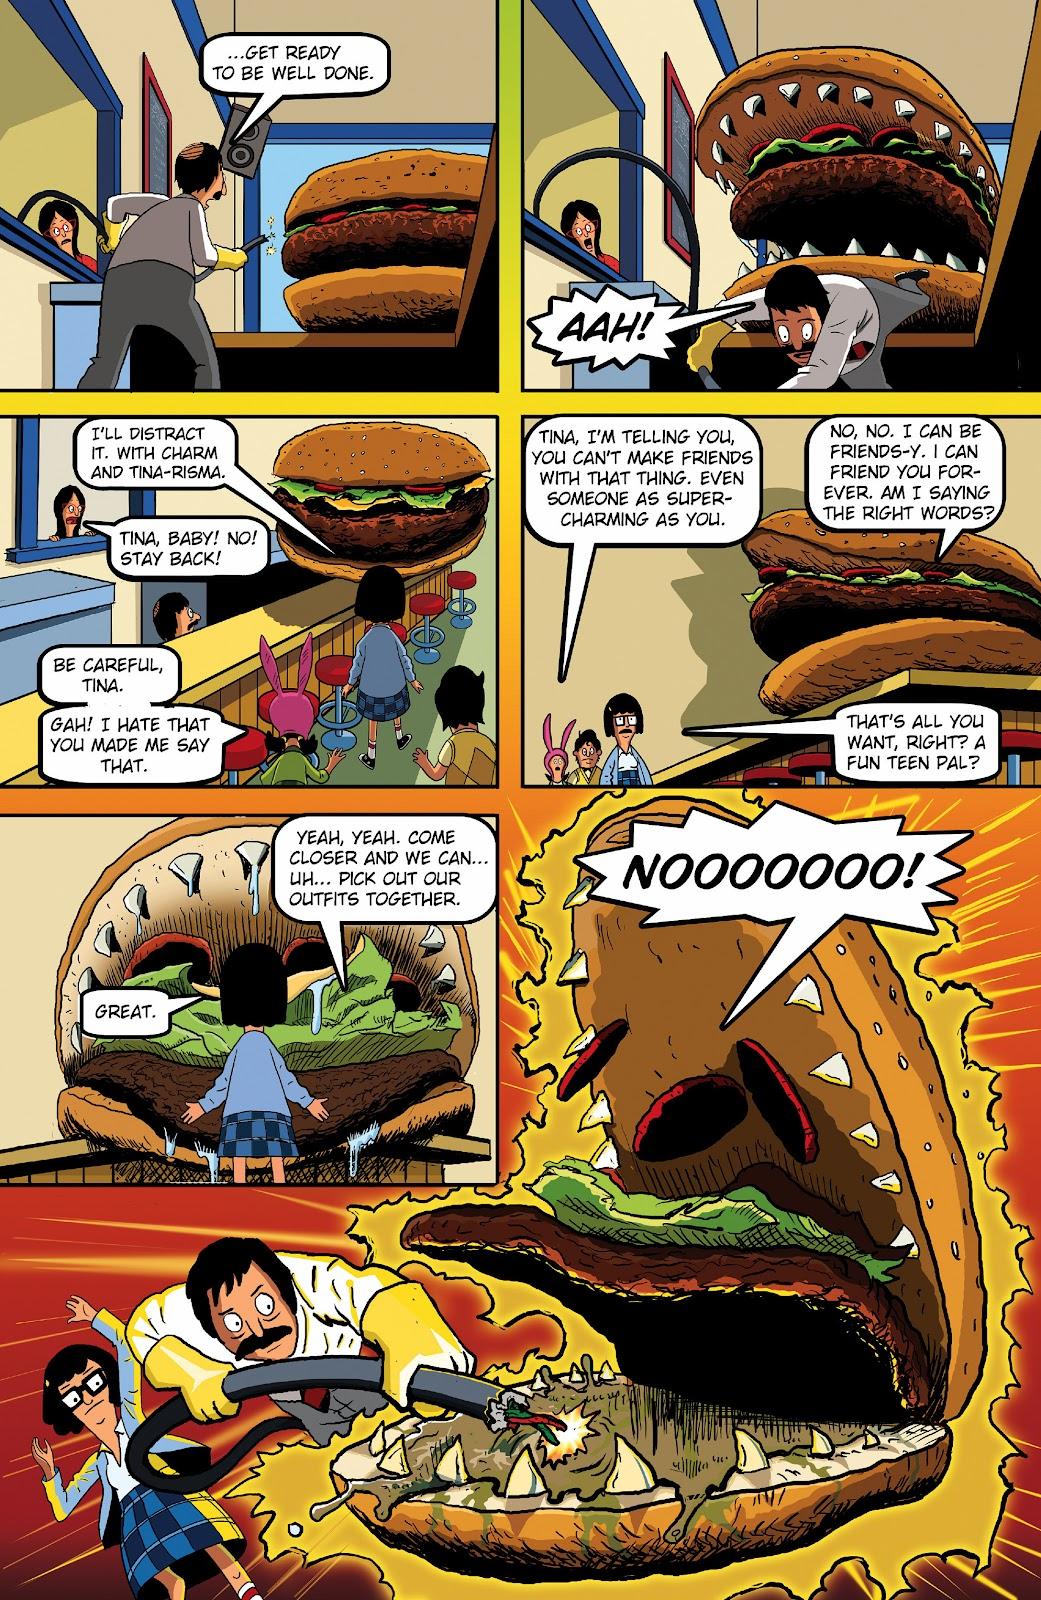 Bob's Burgers (2015) Issue #16 #16 - English 23